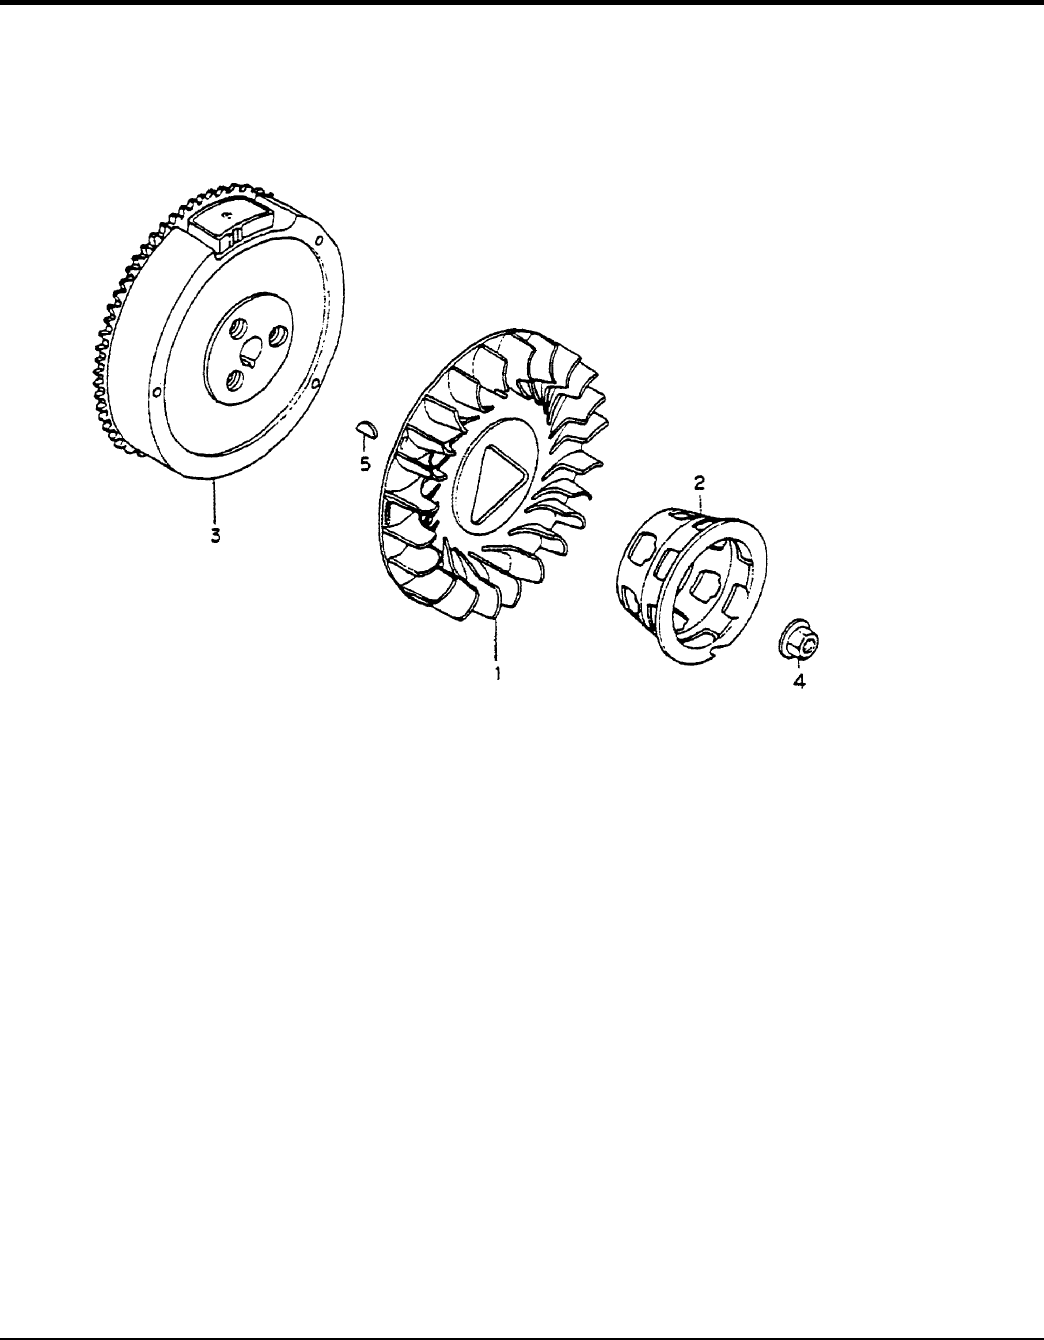 30a 125v Locking Plug Wiring Diagram Schematic Wiring